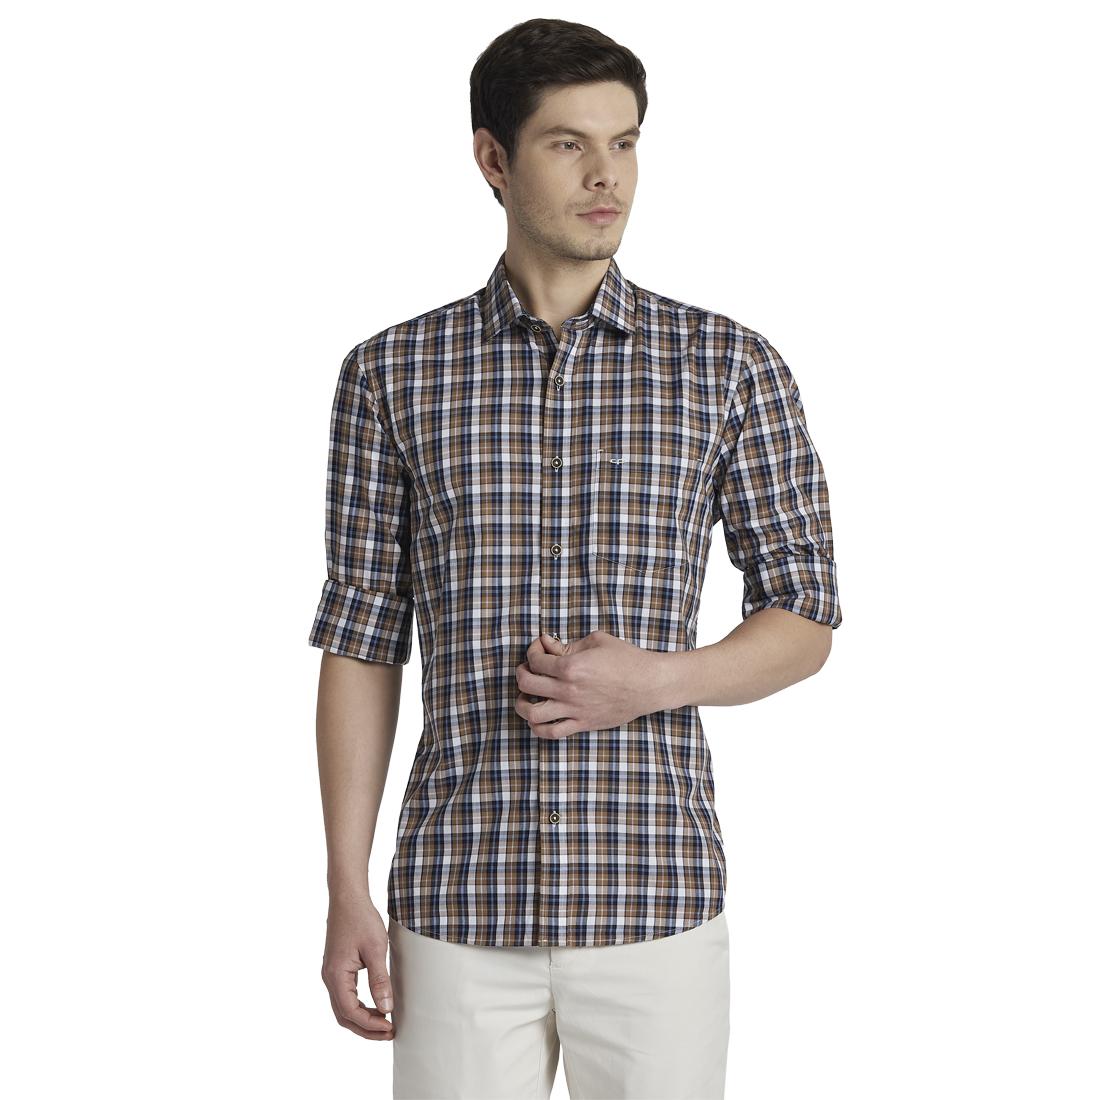 ColorPlus | ColorPlus Medium Brown Shirt